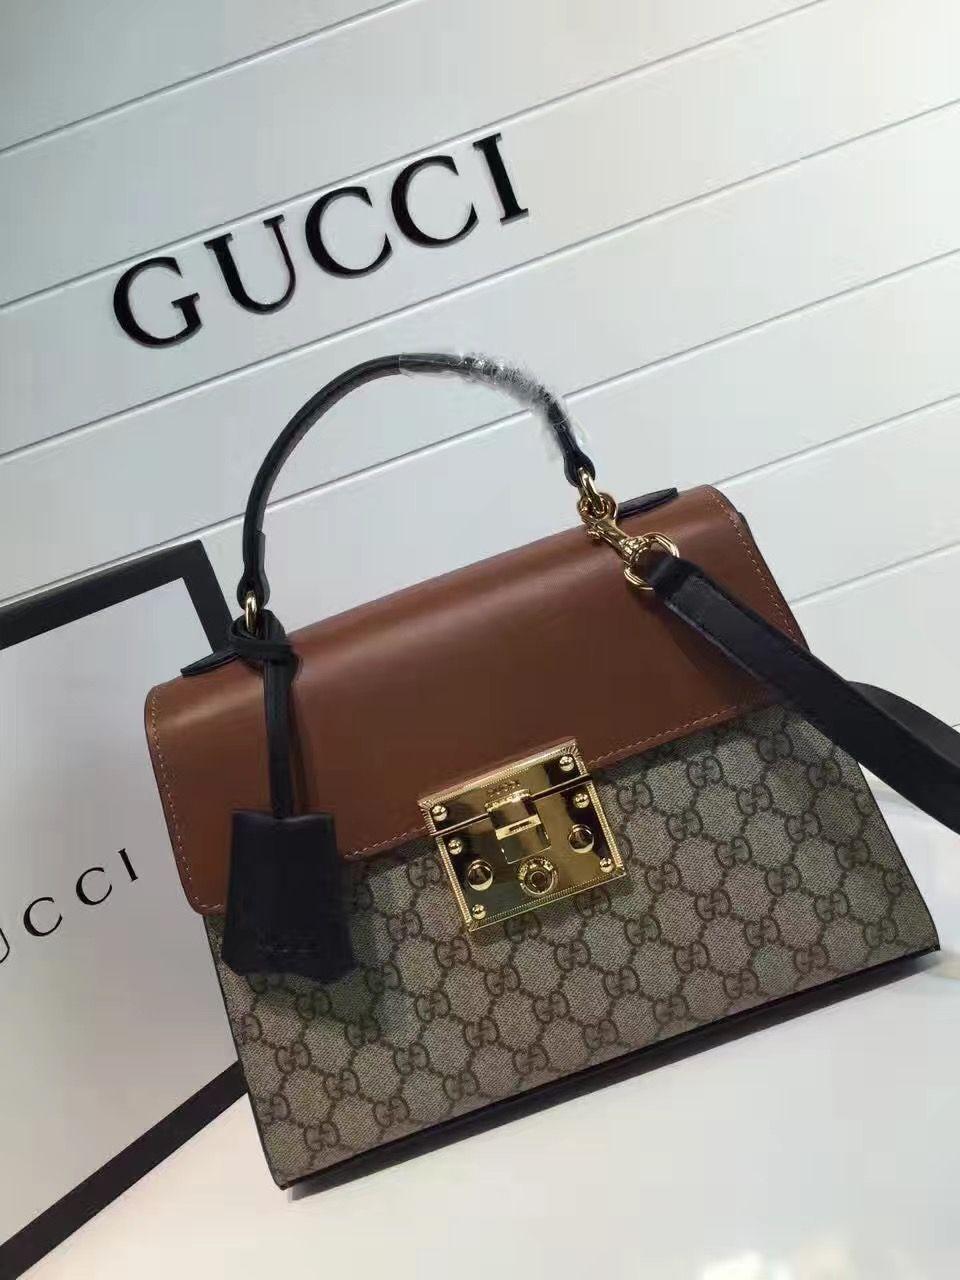 e506a5af6ce8 Gucci Padlock GG Supreme Top Handle Small Bag 453188 Brown 2016 ...